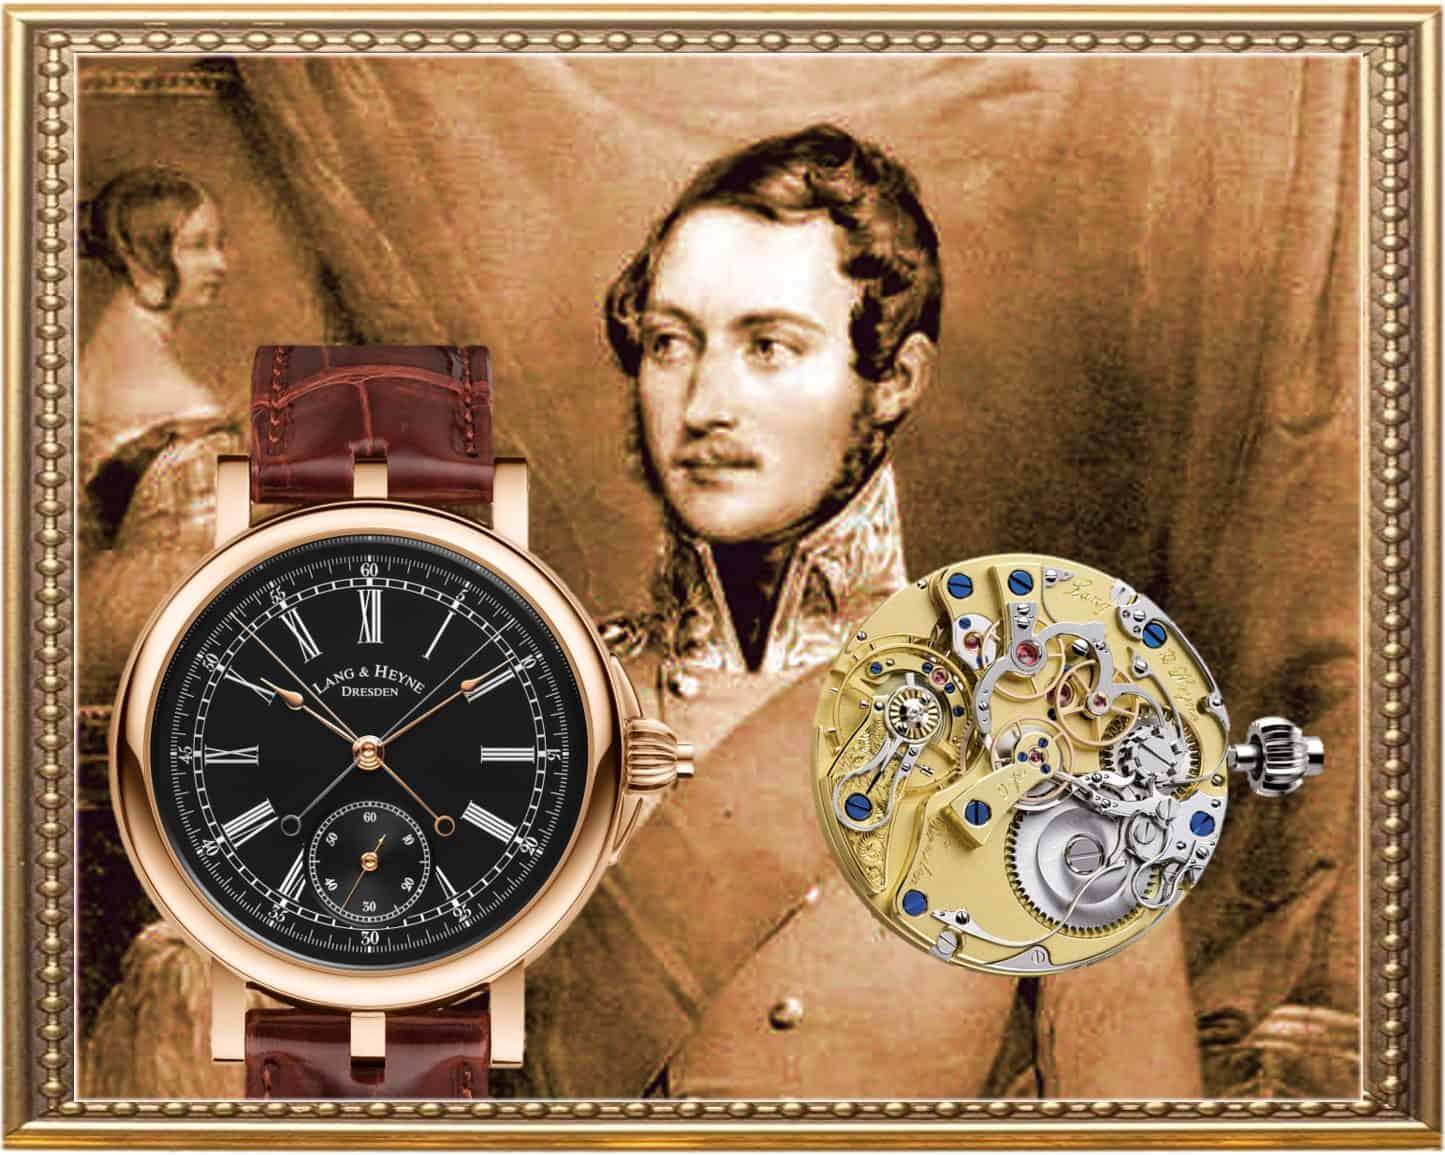 Neuer Lang & Heyne Chronograph AlbertLang & Heyne Albert Chronograph von königlichem Format